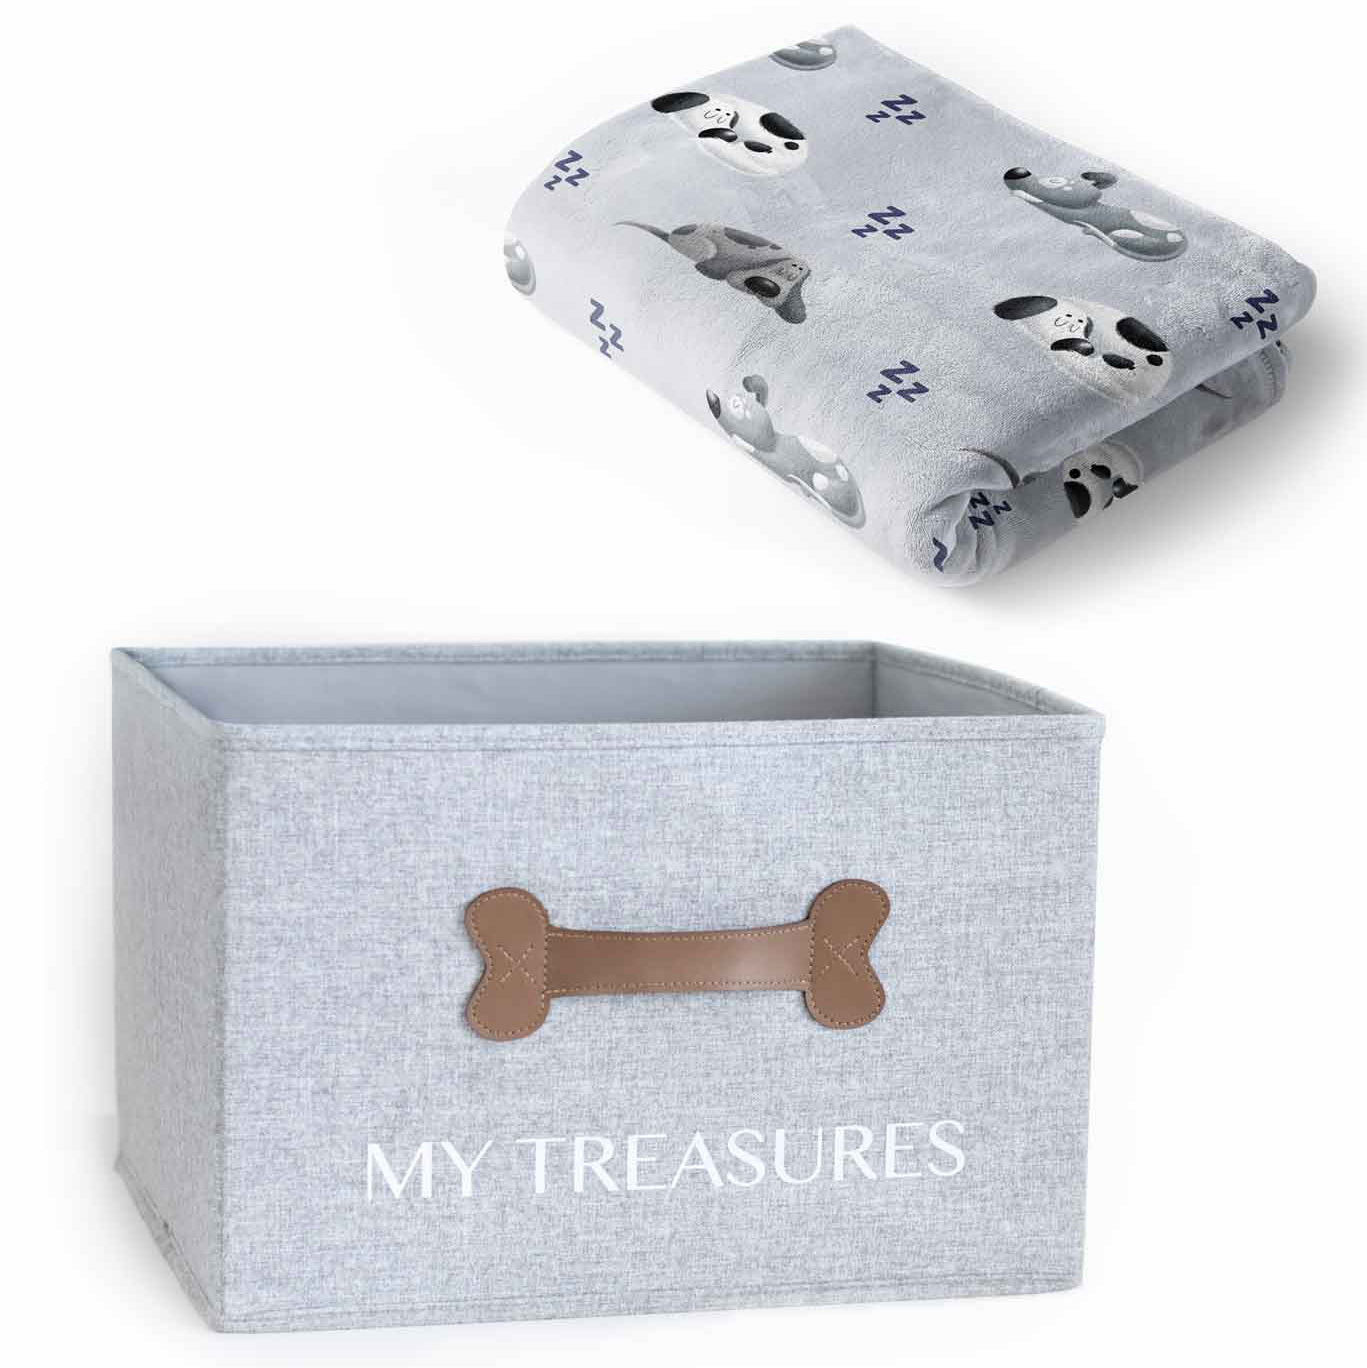 Soft Dog Toys for Cuddlers feat. BULLTUG Cozy Home Bundle Toy Box and Blanket Set via Amazon